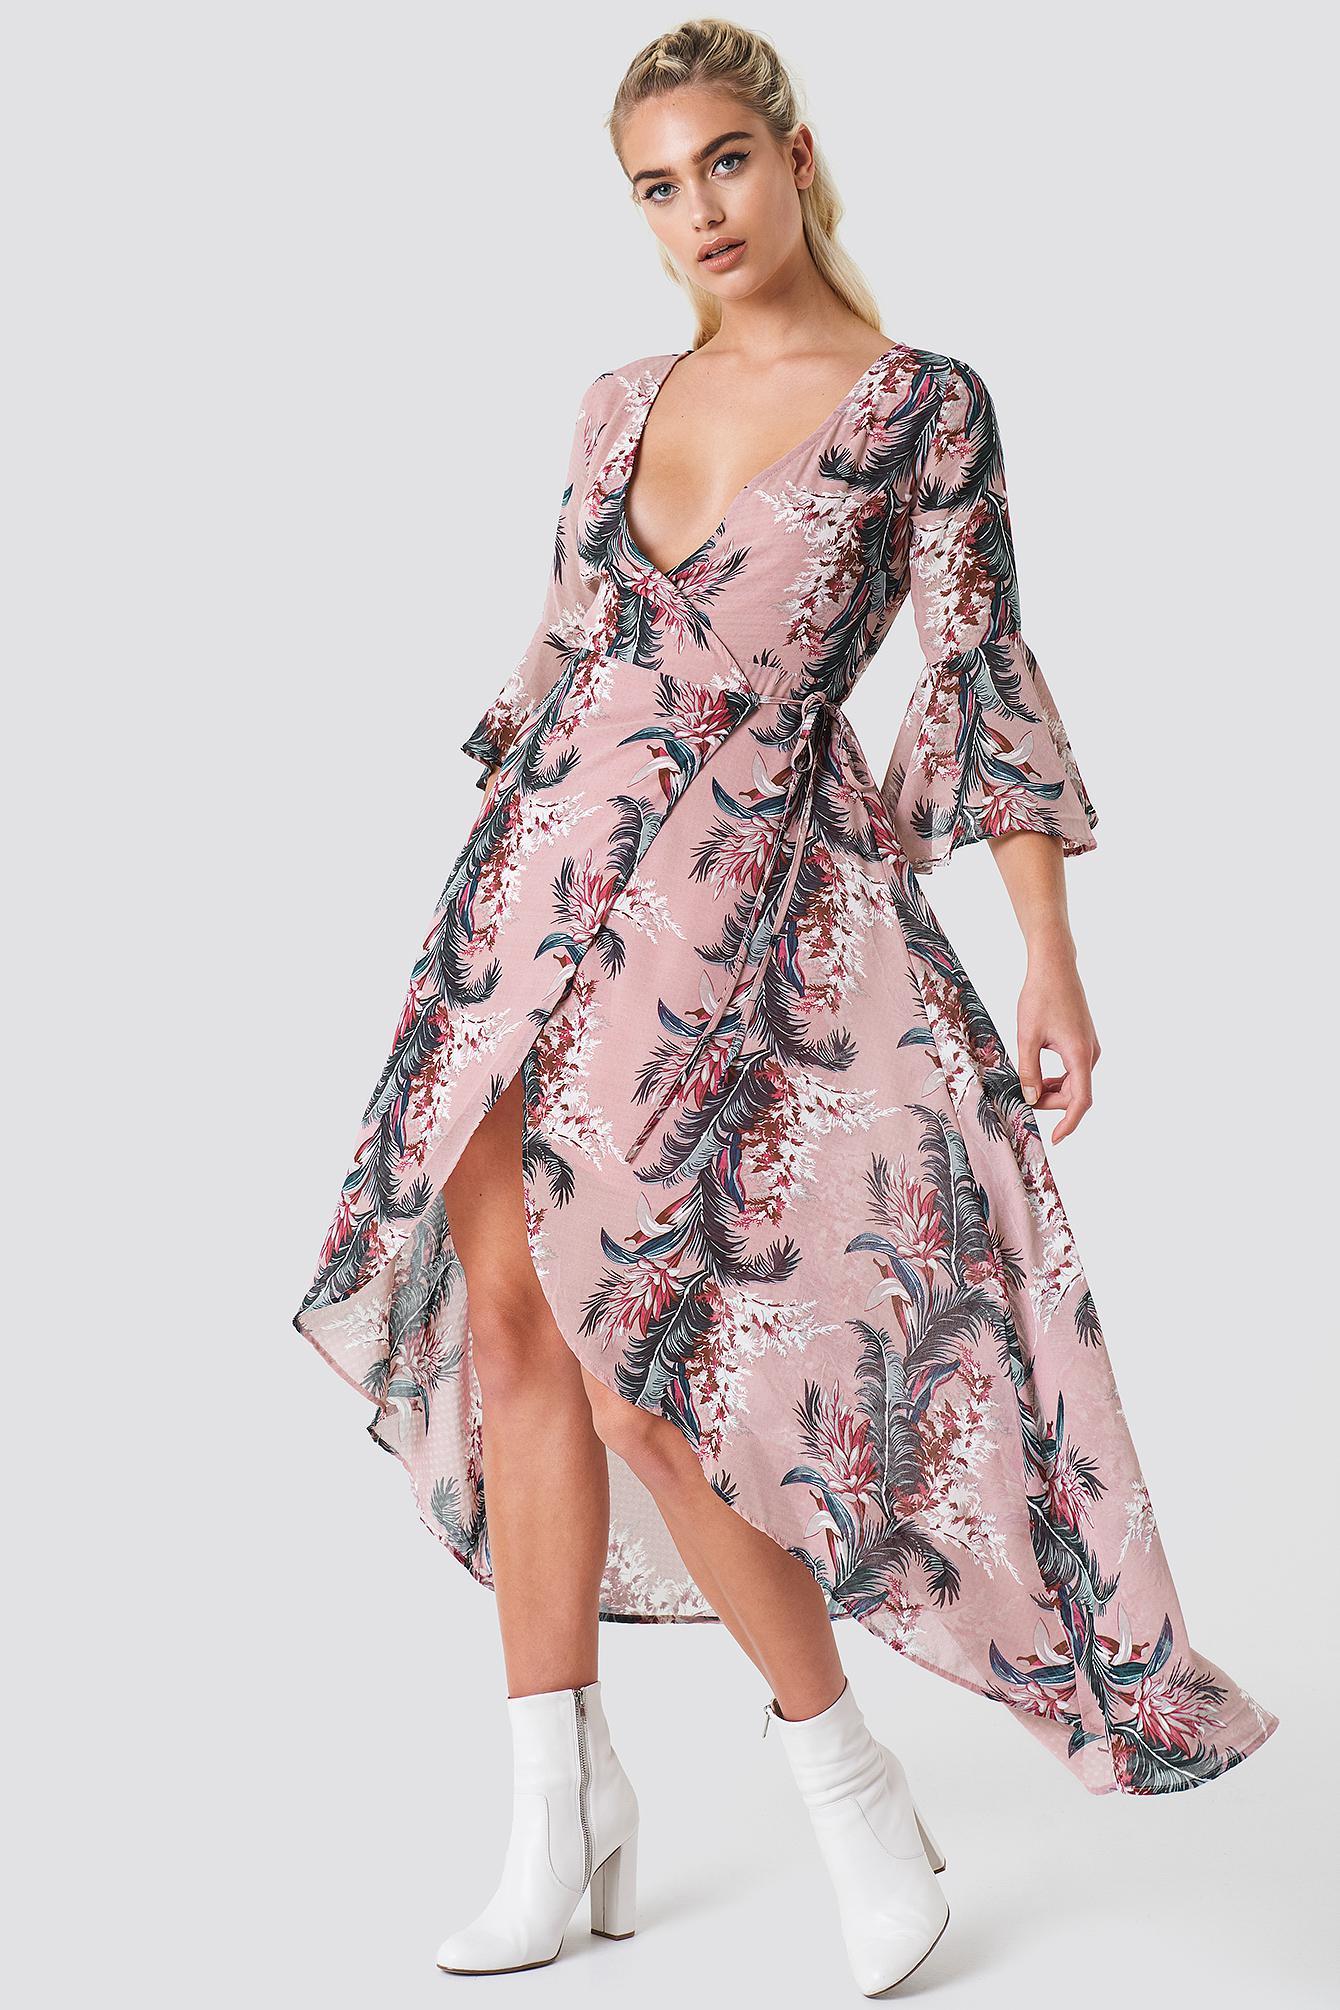 Glamorous Wrap Maxi Print Dress - 5mCnLcc